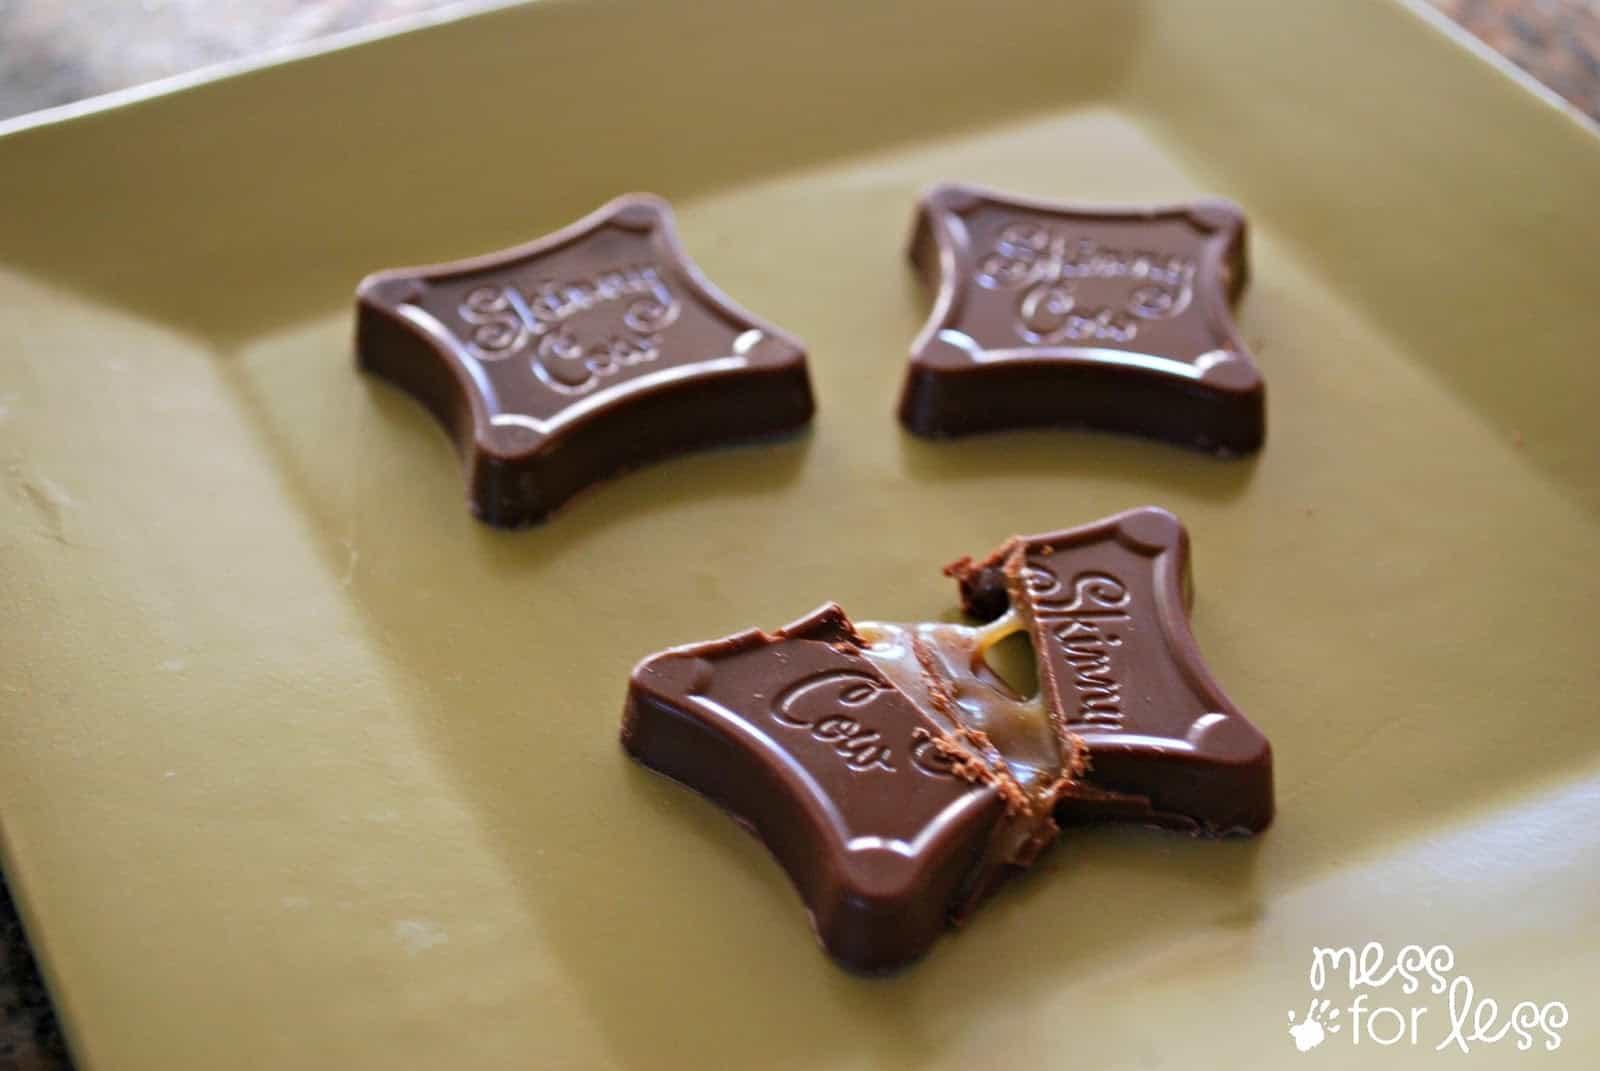 Skinny Cow Divine Chocolates #WowThatsGood #shop #cbias